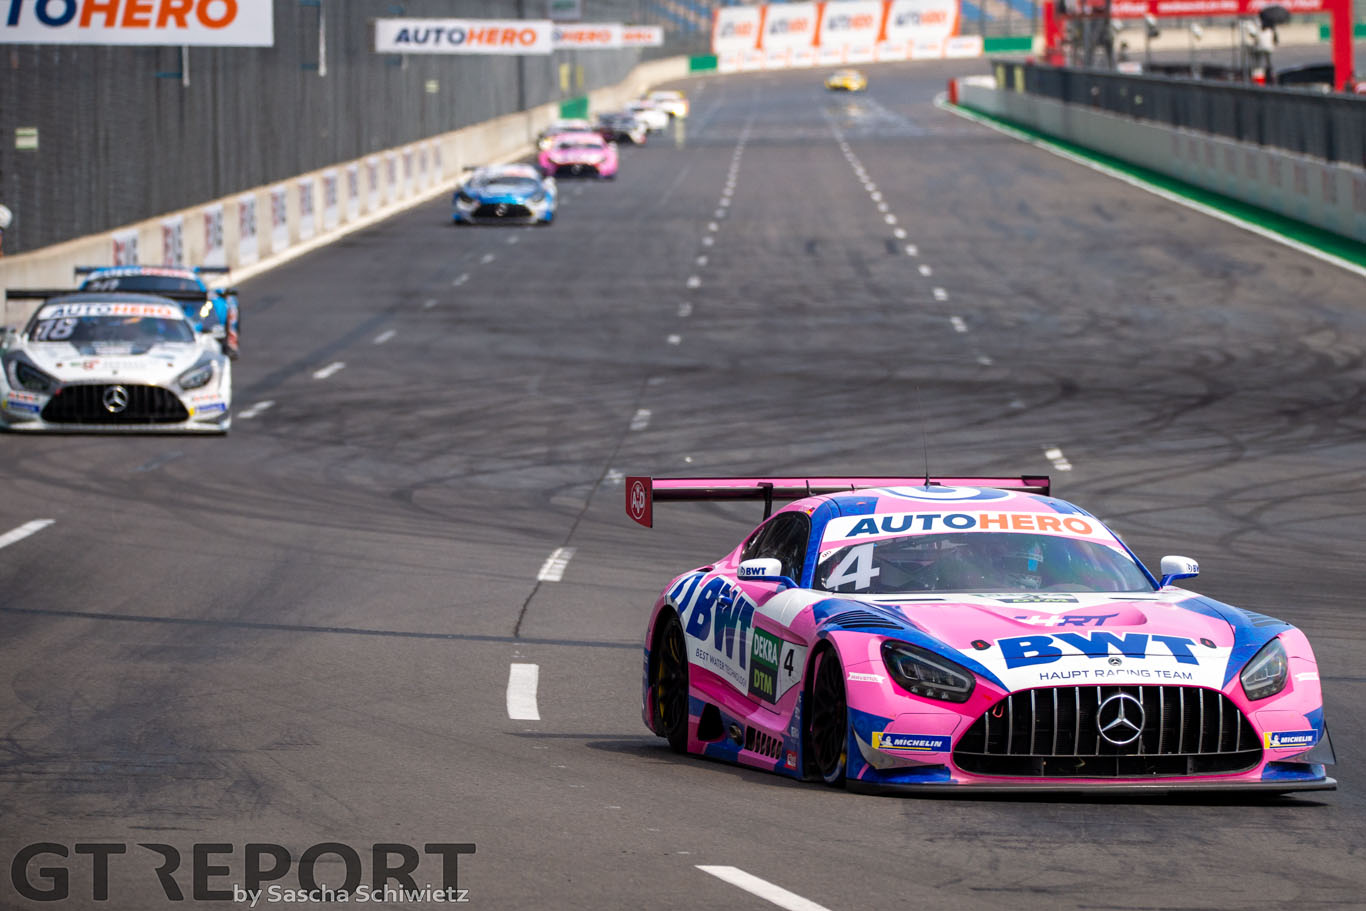 DTM Lausitzring race 2 report: Götz takes win as Kelvin van der Linde stutters